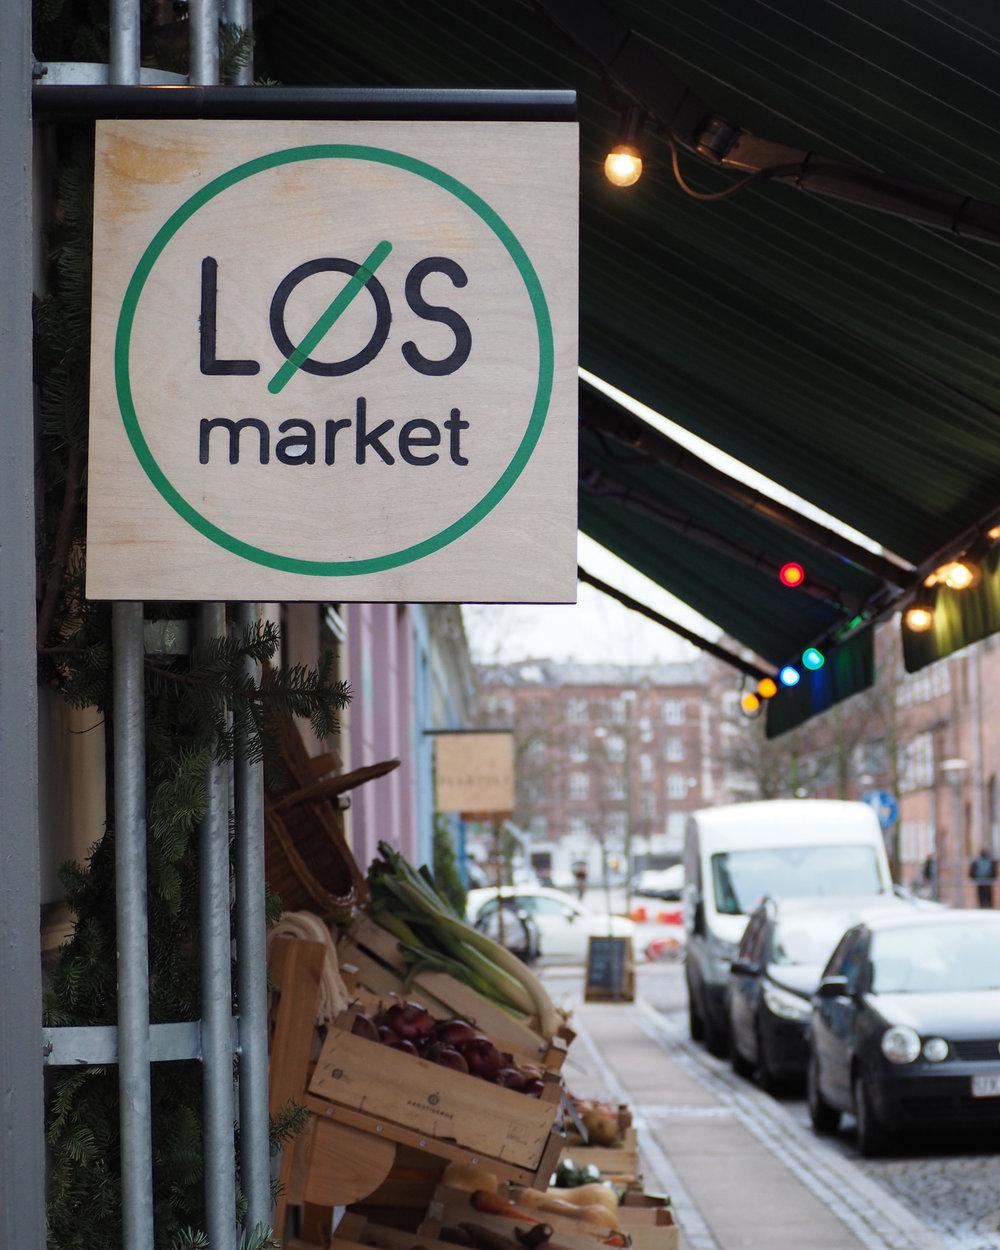 LOS market2.jpg